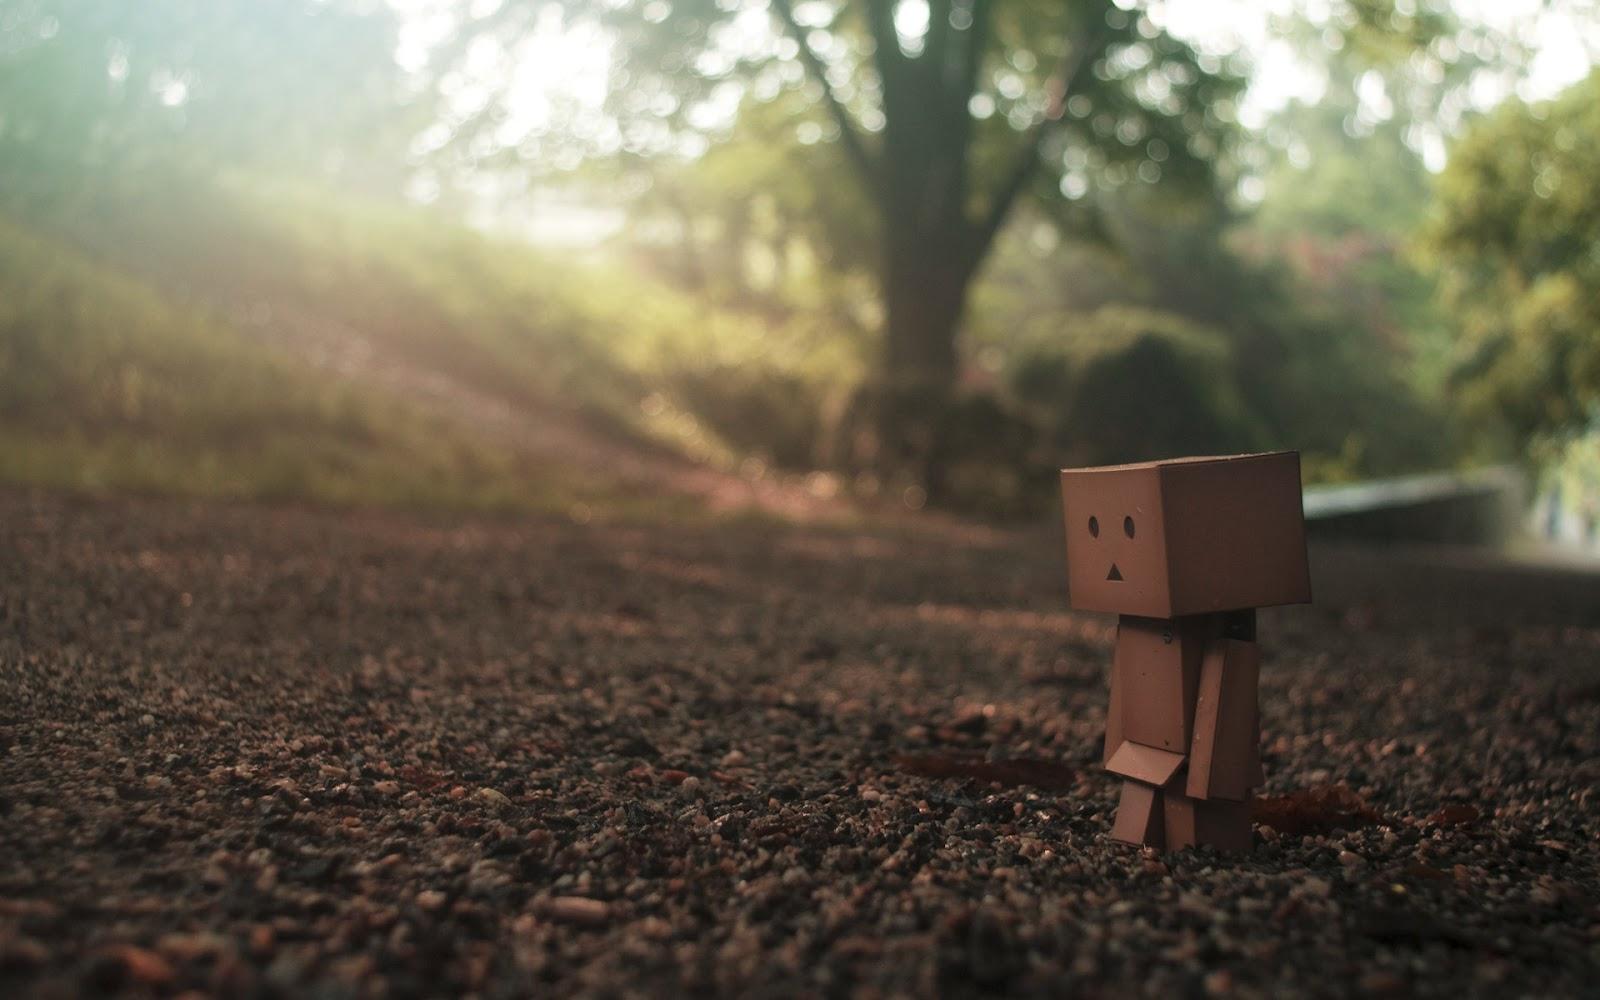 alone sad alone sad alone sad alone sad alone sad alone sad alone sad 1600x1000